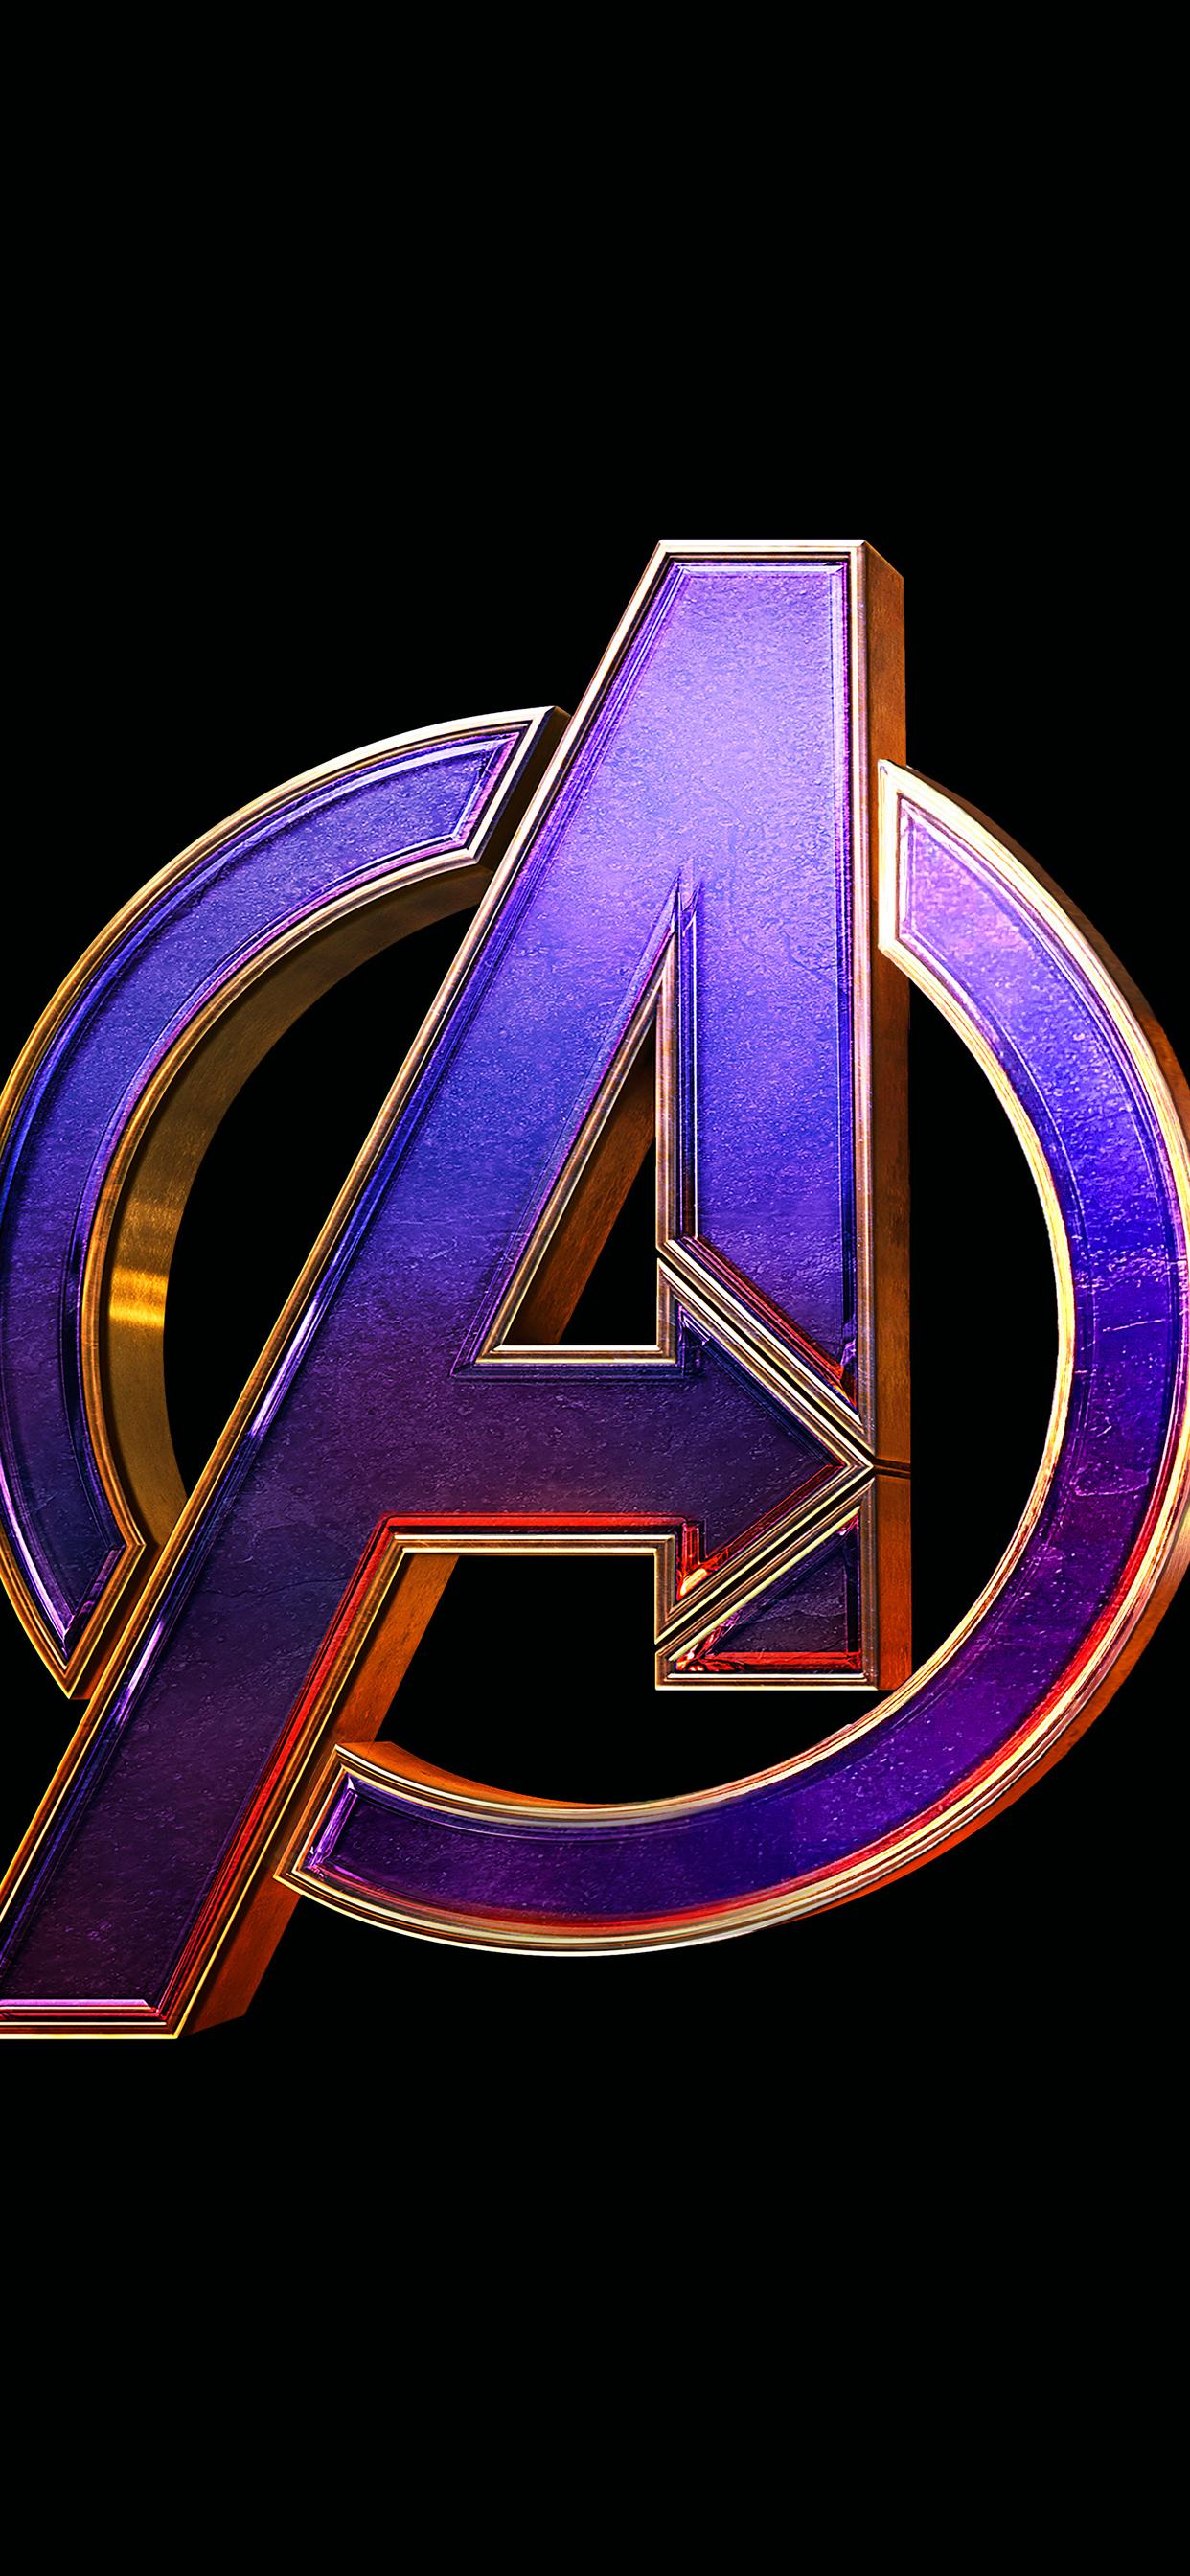 1242x2688 Avengers Endgame Logo 4k Iphone XS MAX HD 4k ...